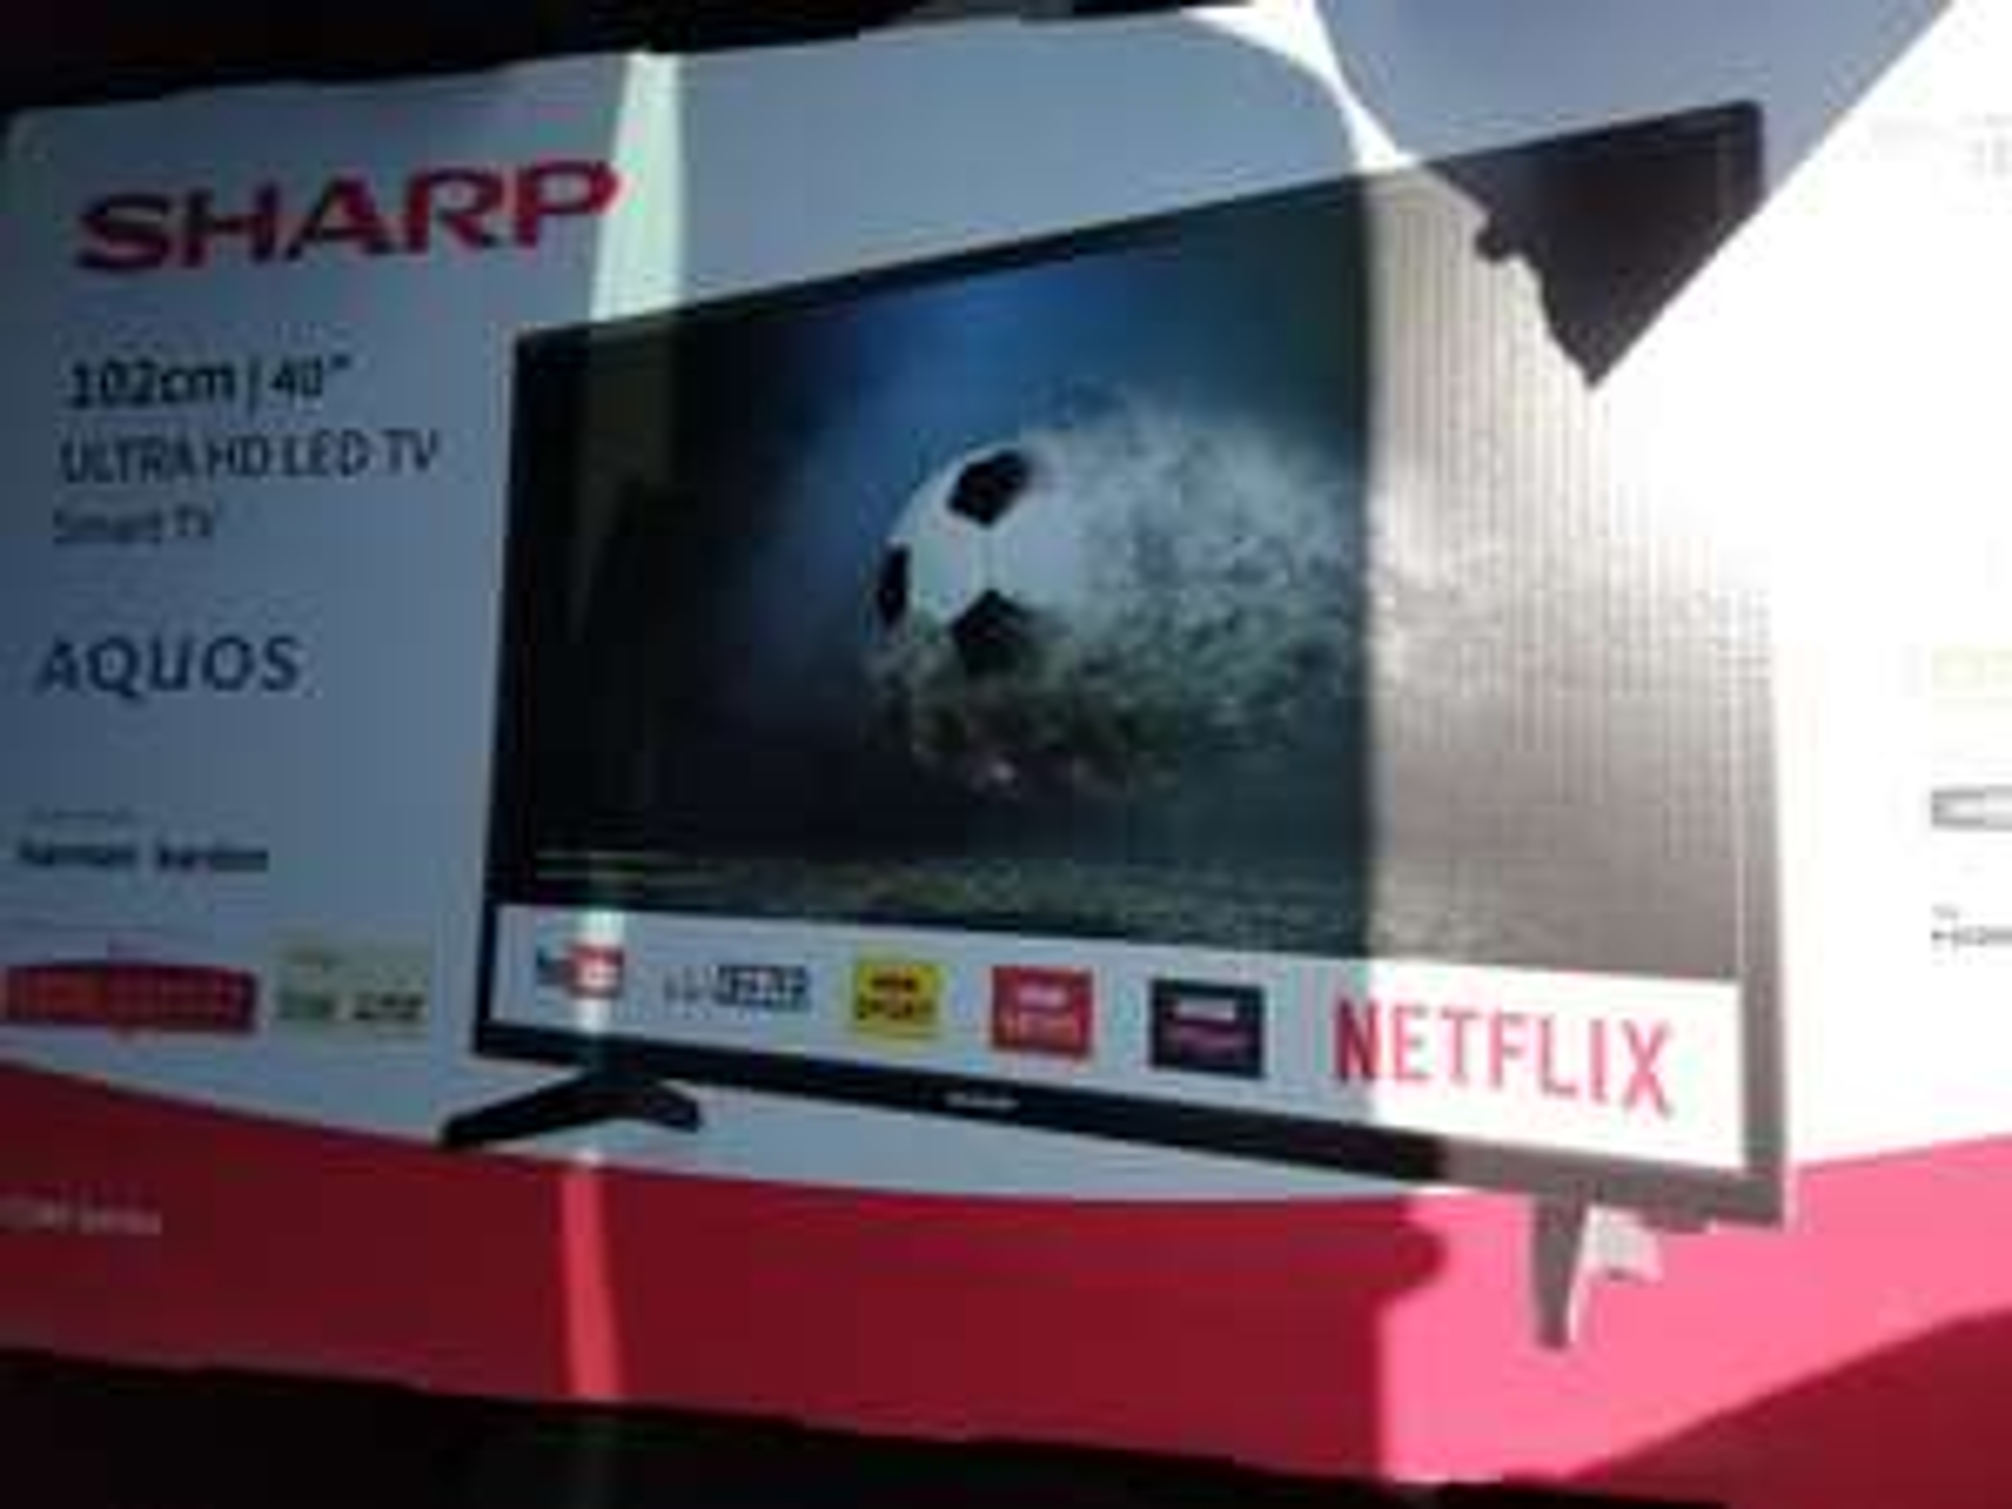 "Sharp Aquos LC-40UG7242K 40"" UHD 4k Smart TV in store with 5 year guarantee - £179 instore @ Asda"